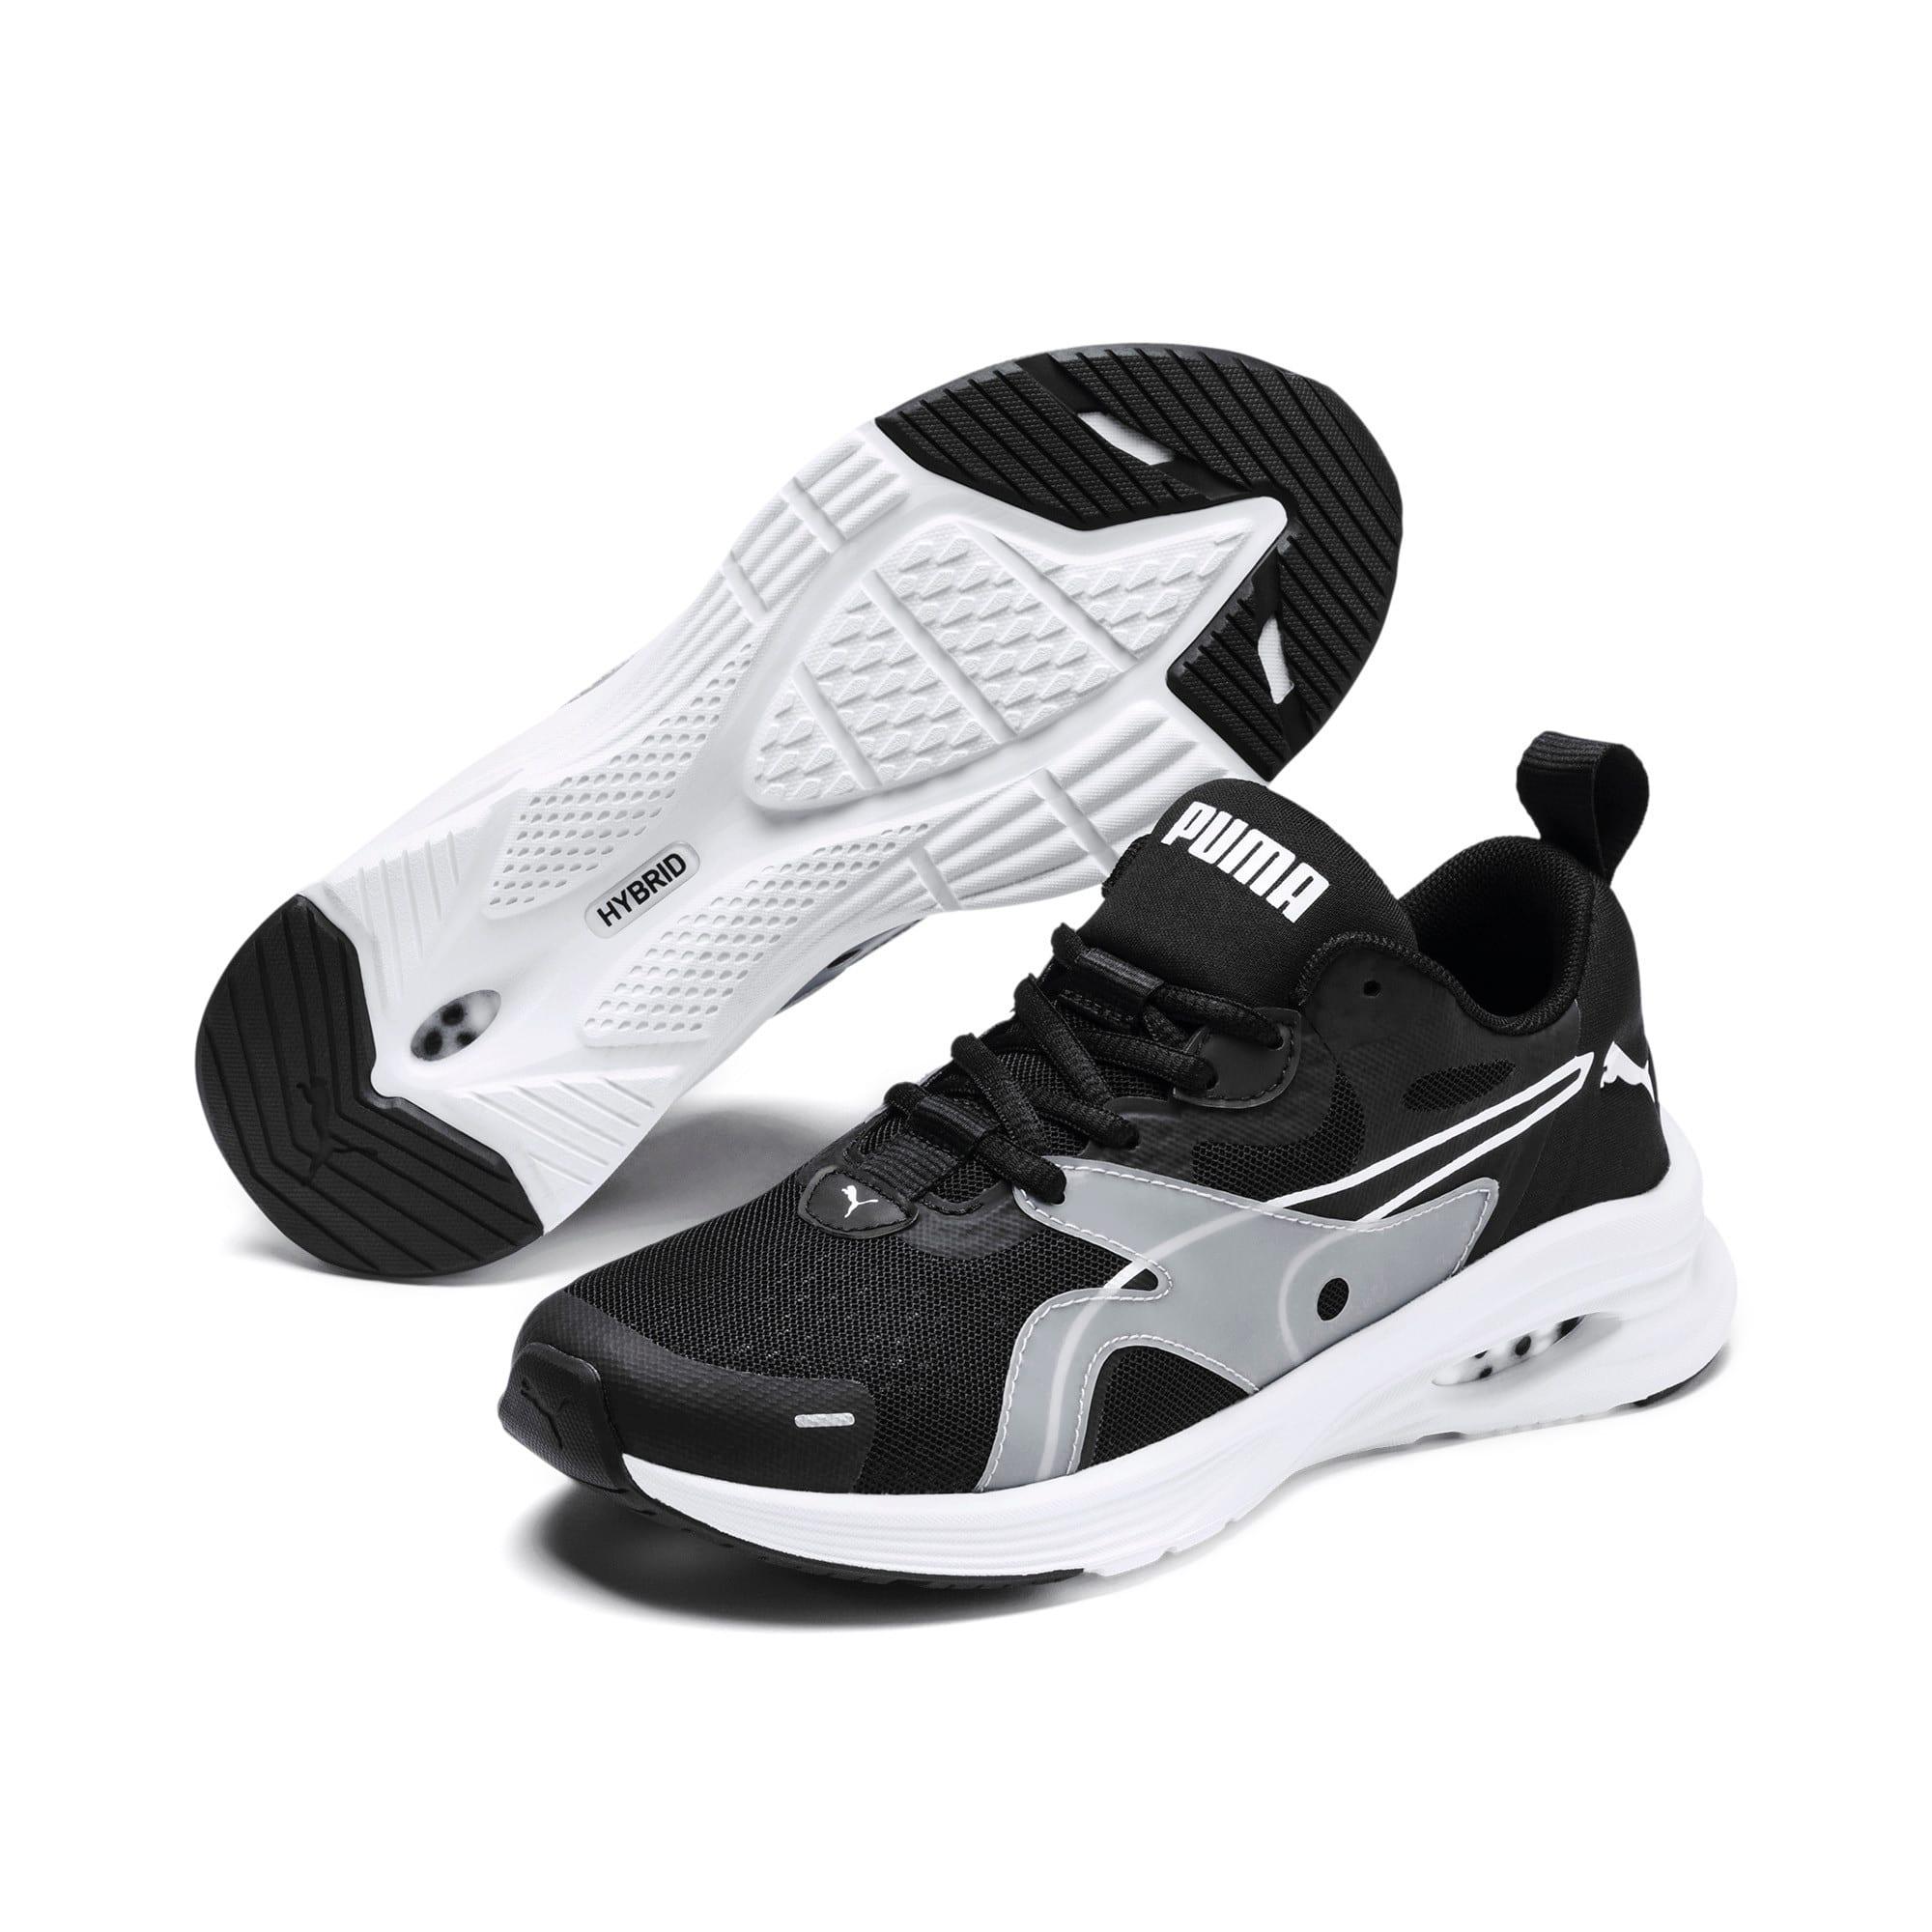 Thumbnail 2 of HYBRID Fuego Running Shoes JR, Puma Black-Puma White, medium